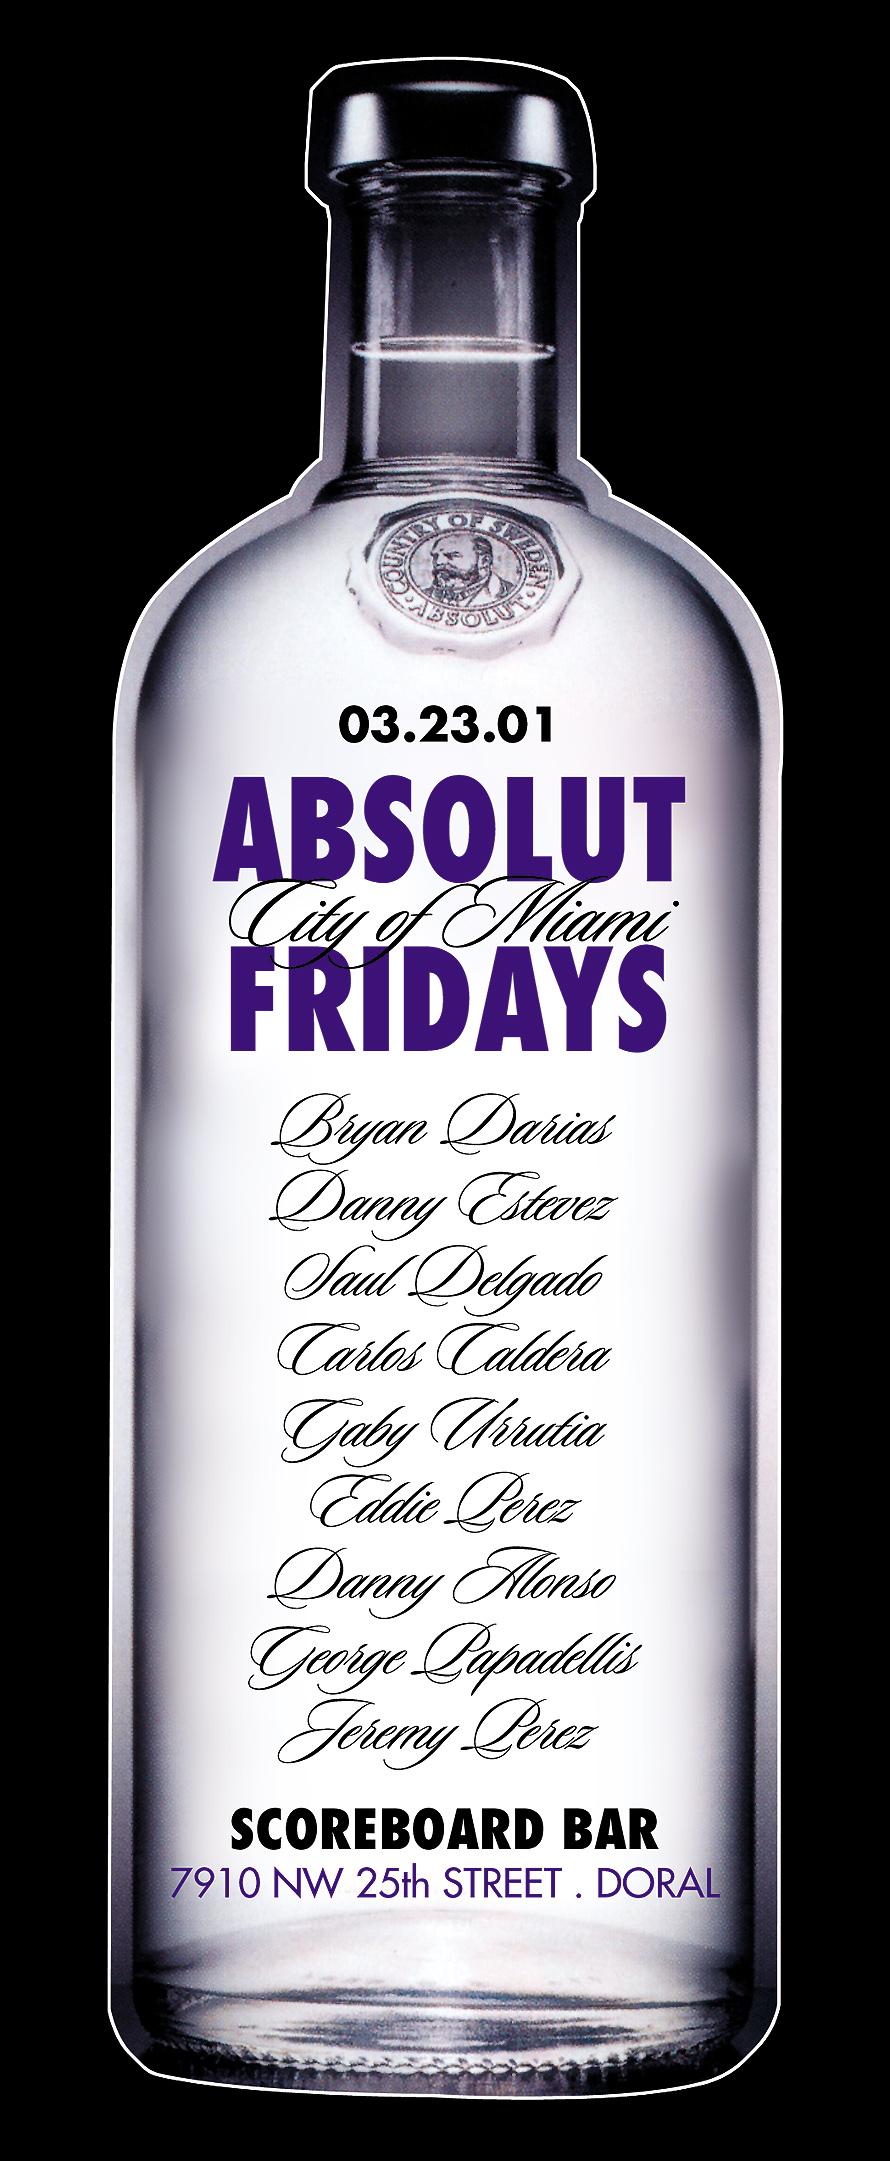 Absolut Fridays at The Scoreboard Bar